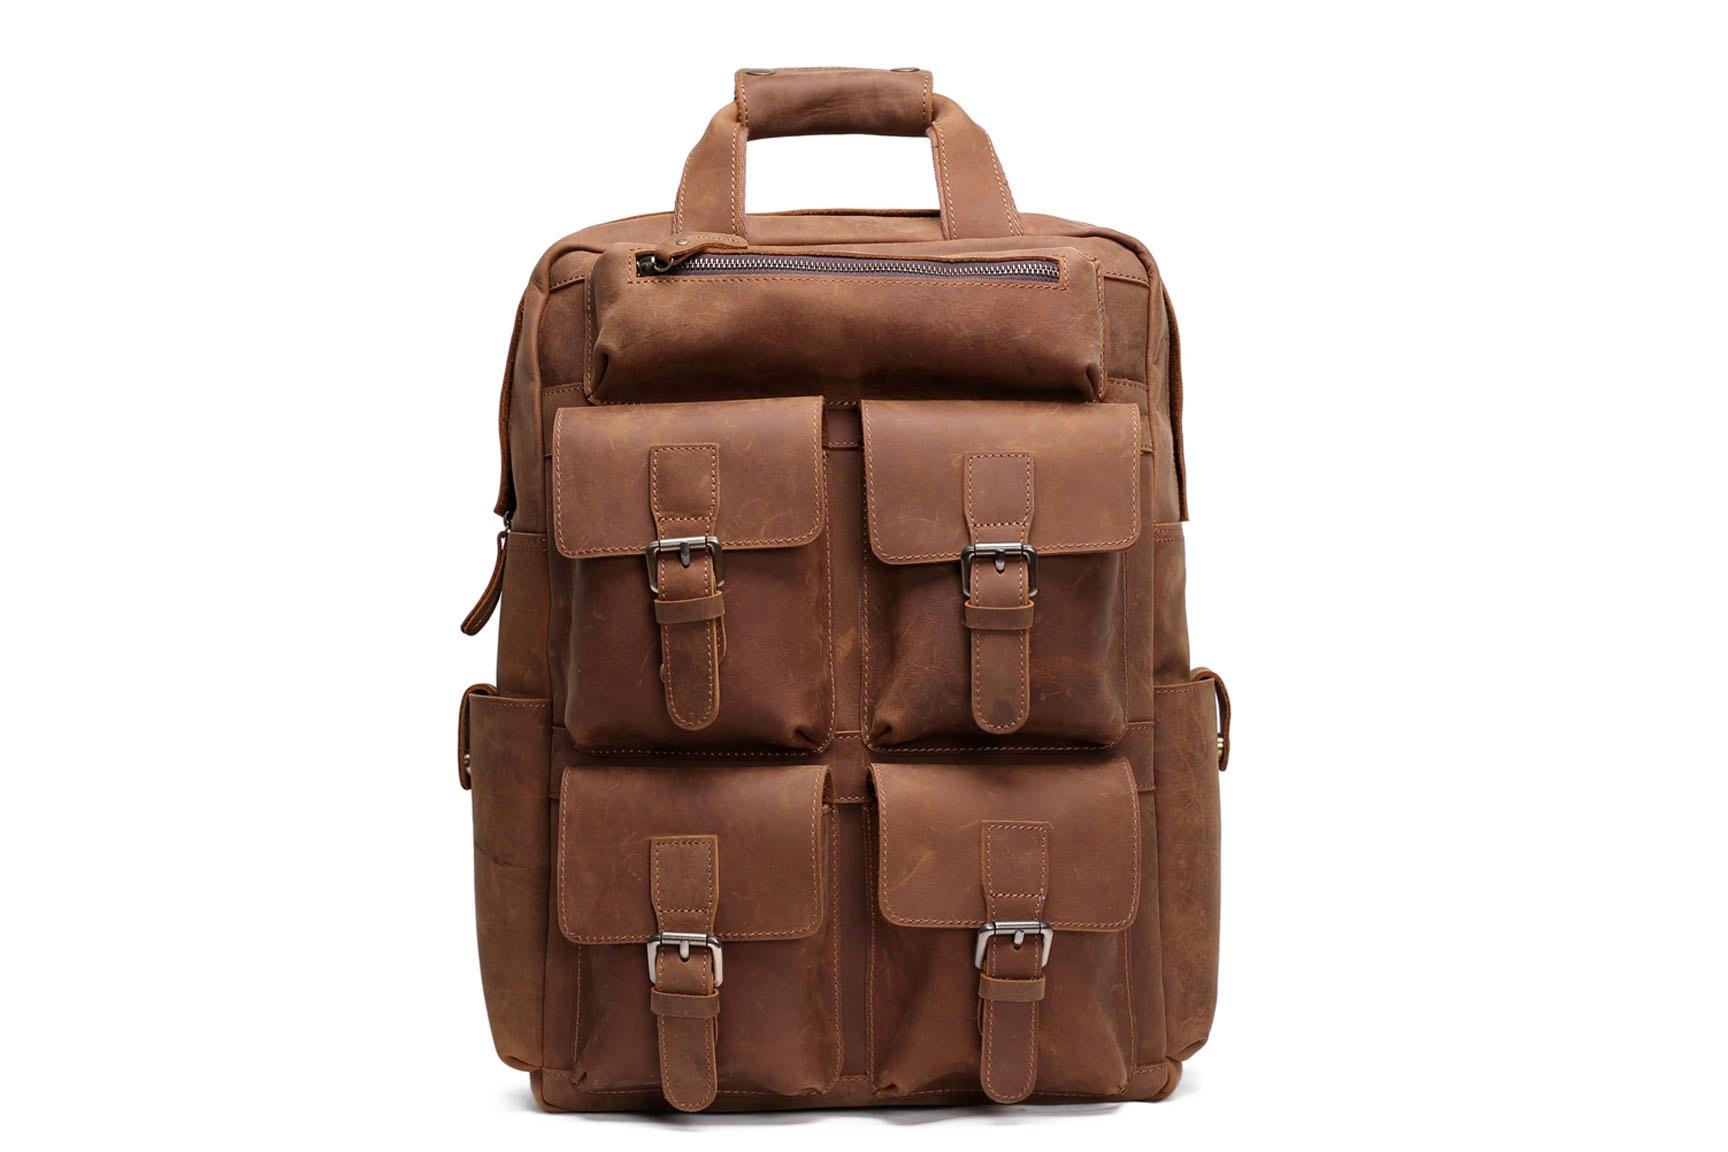 Handmade Vintage Leather Backpack Large Travel Backpack B826 ... 1e57566433bc